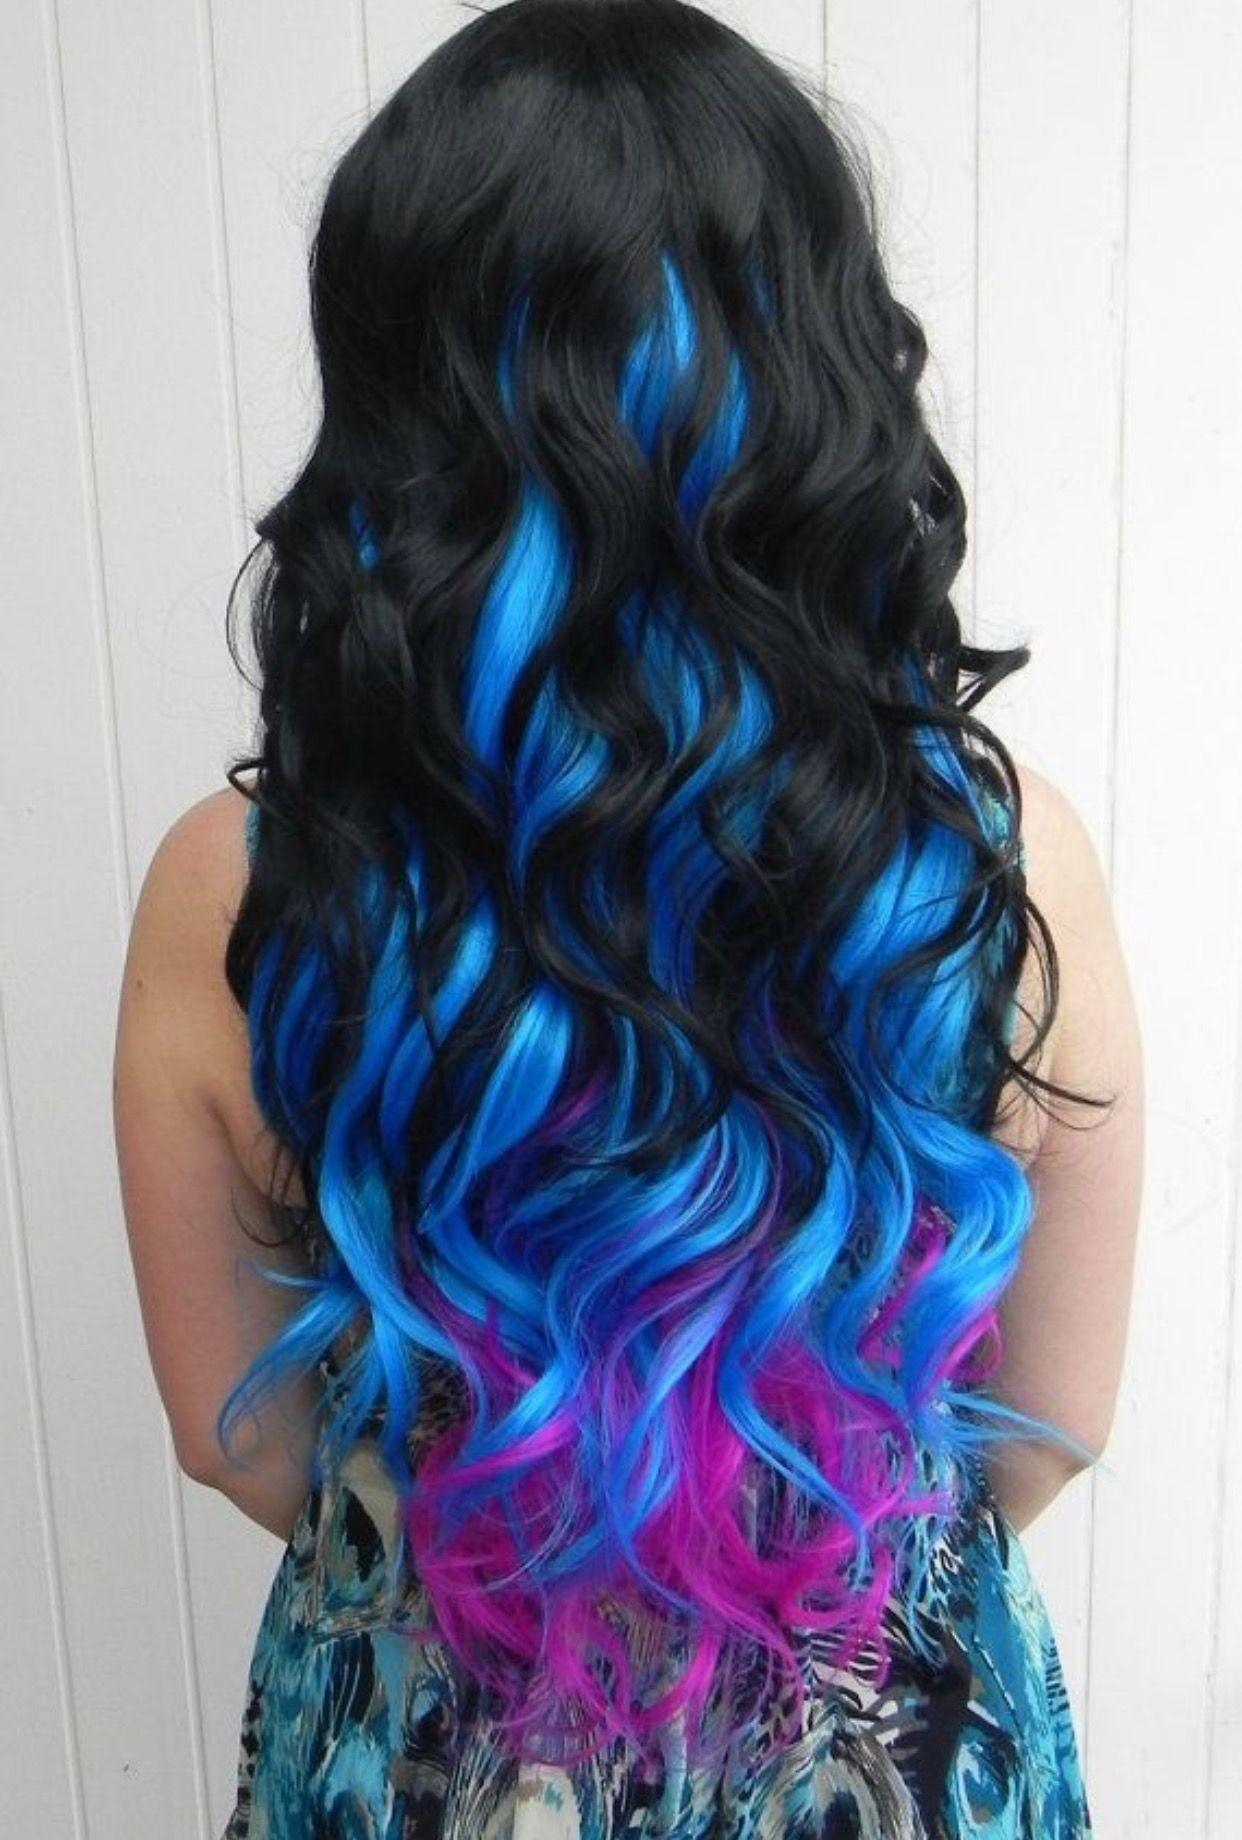 hair pinterest hair dye hair coloring and hair style